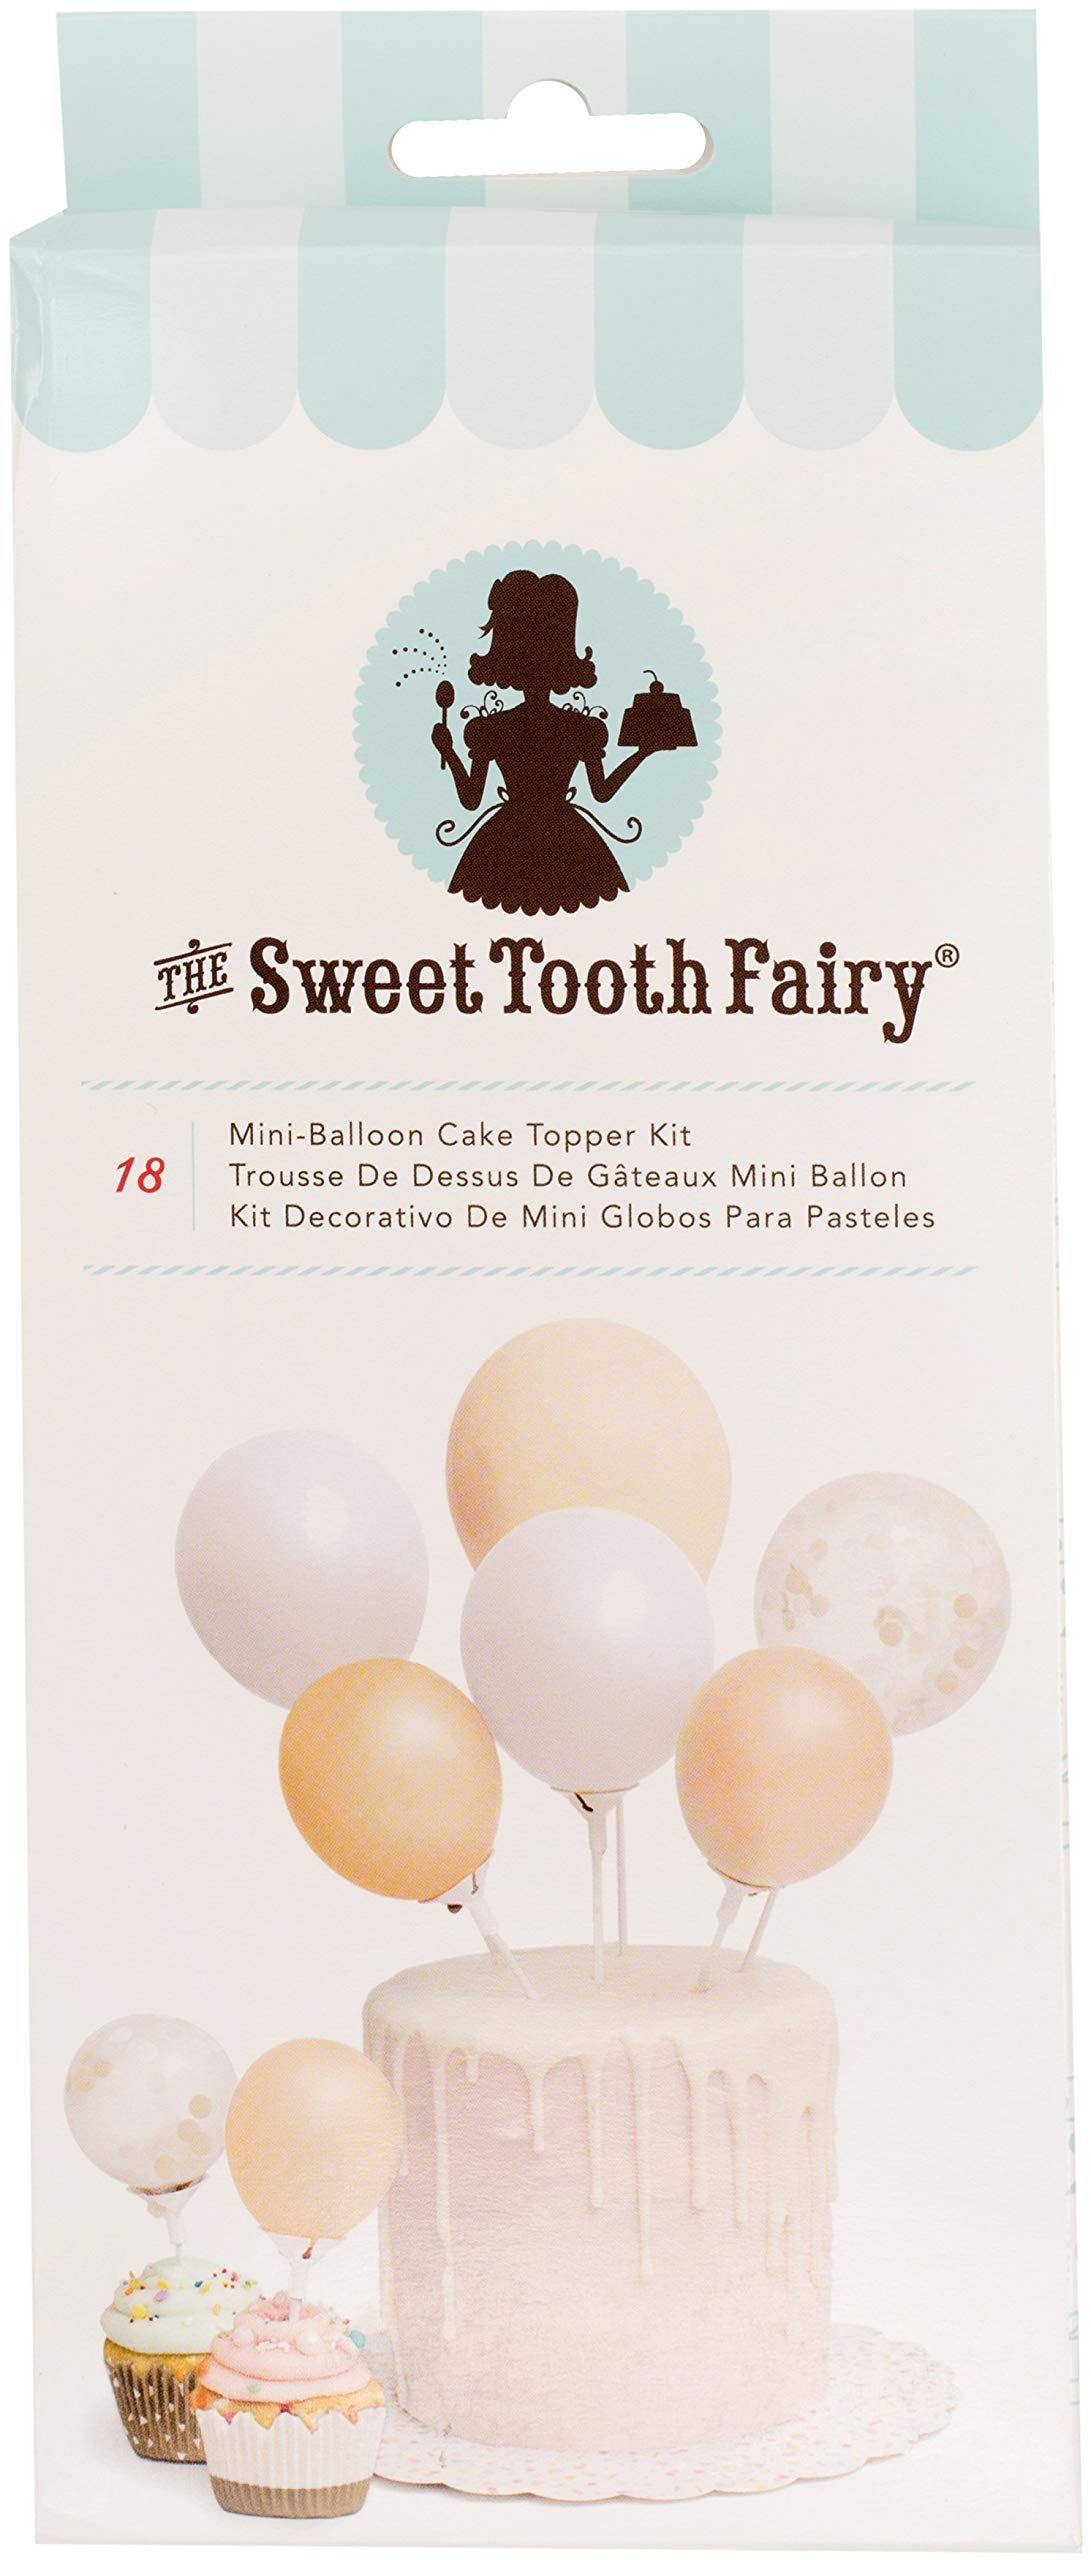 771b9cf64f50541193516e2d6d4e9c38 - Sweet Tooth Fairy Job Application